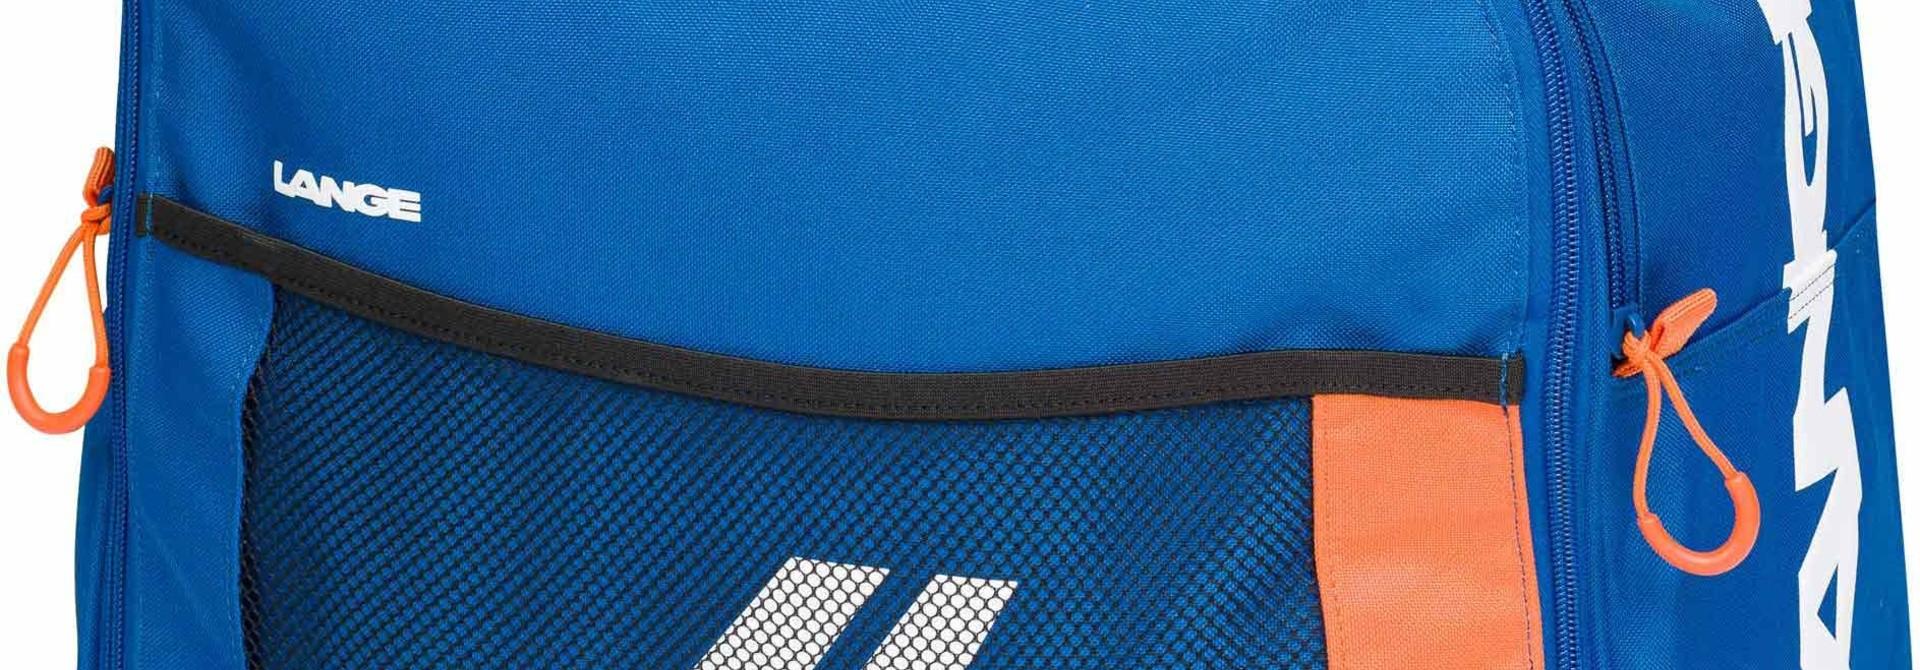 Lange Pro Boot Bag